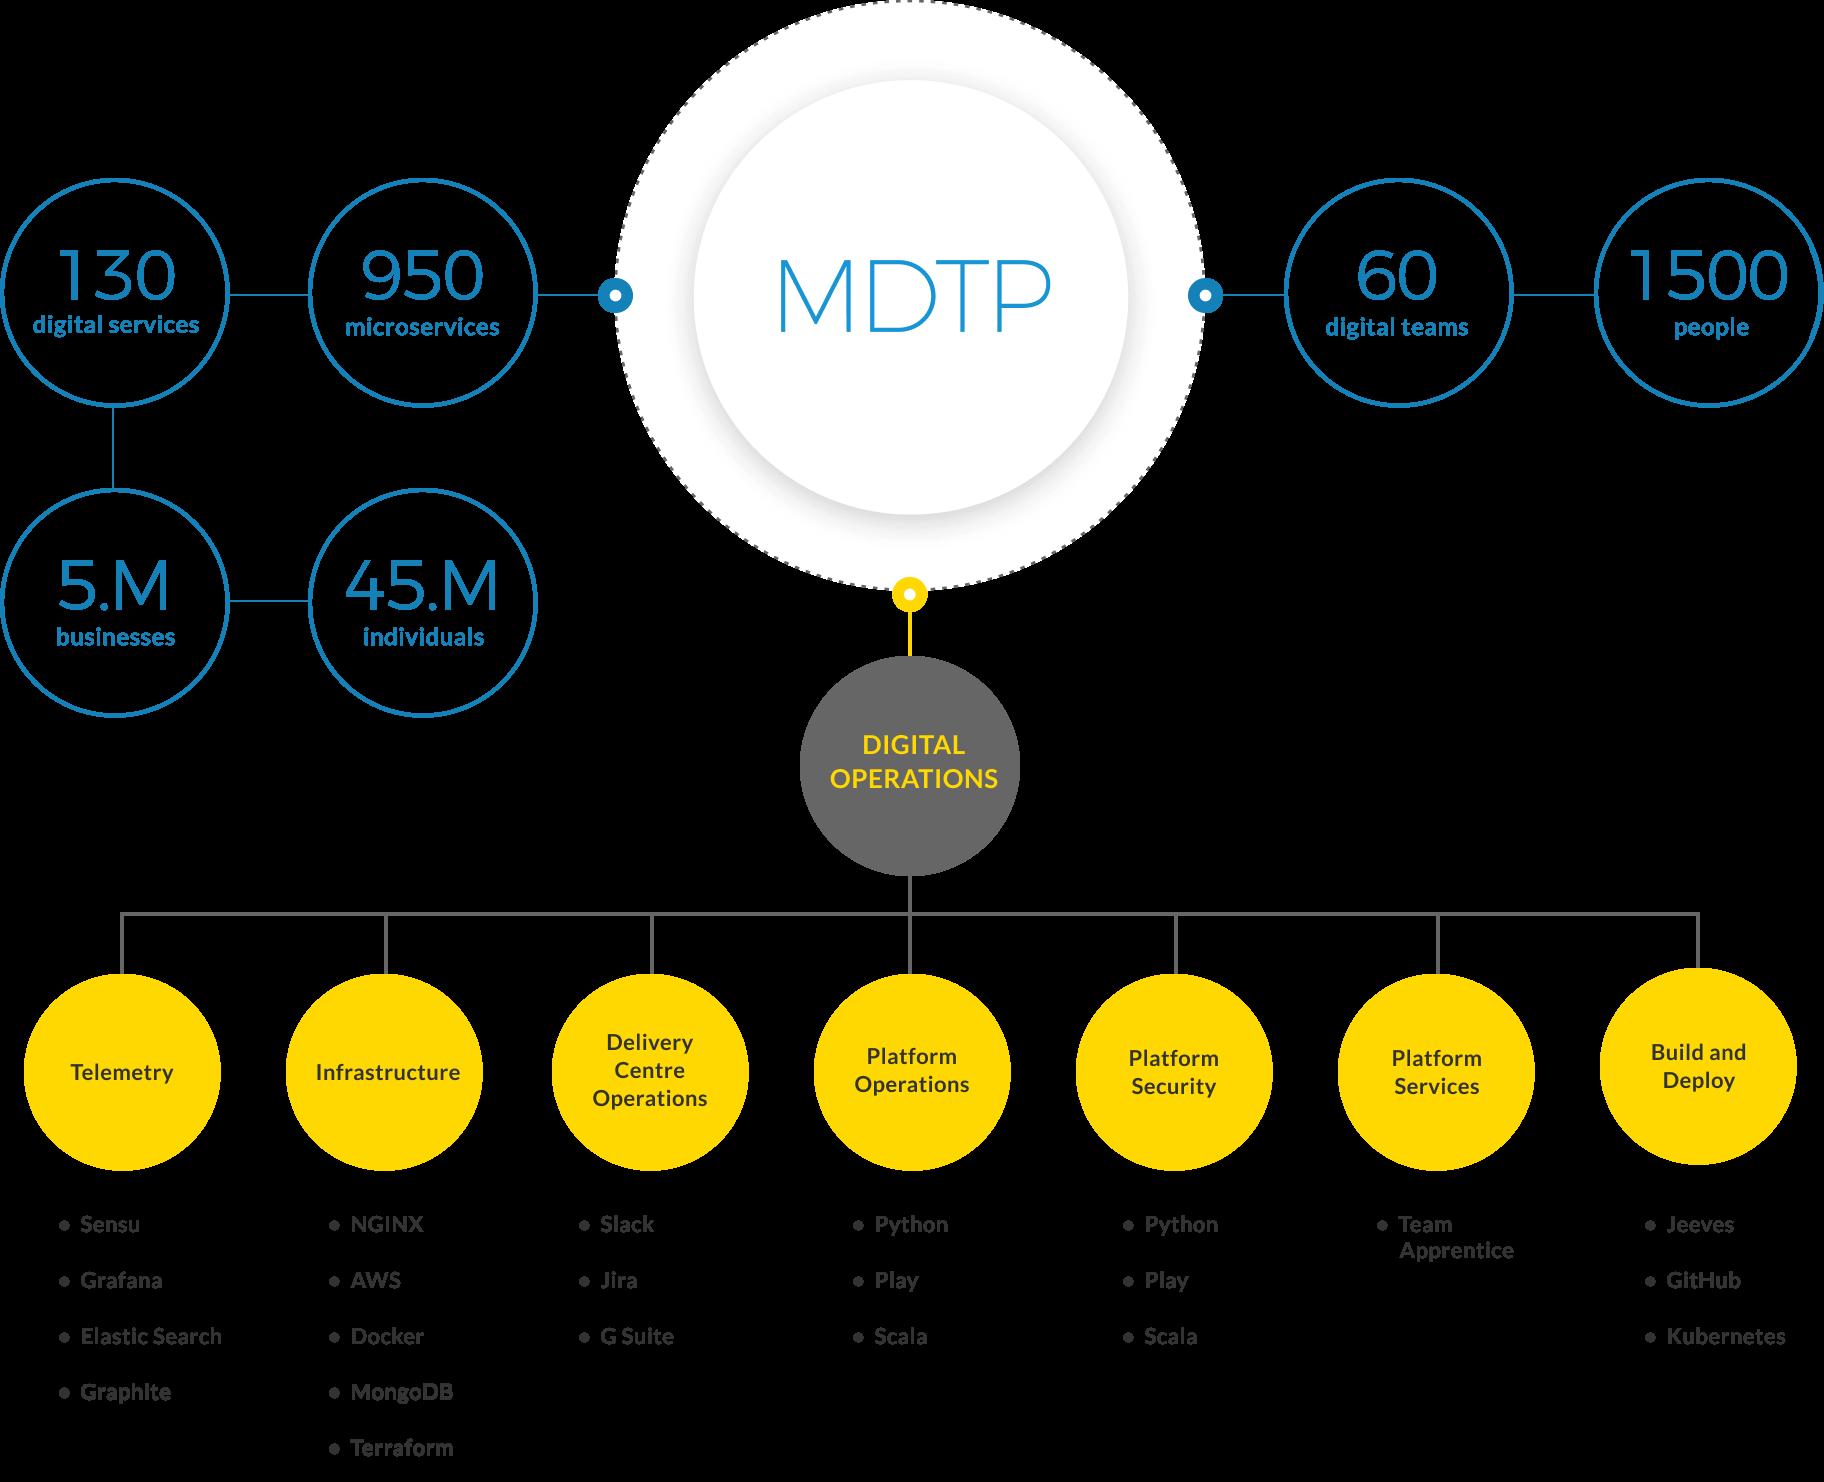 Functionality of MDTP